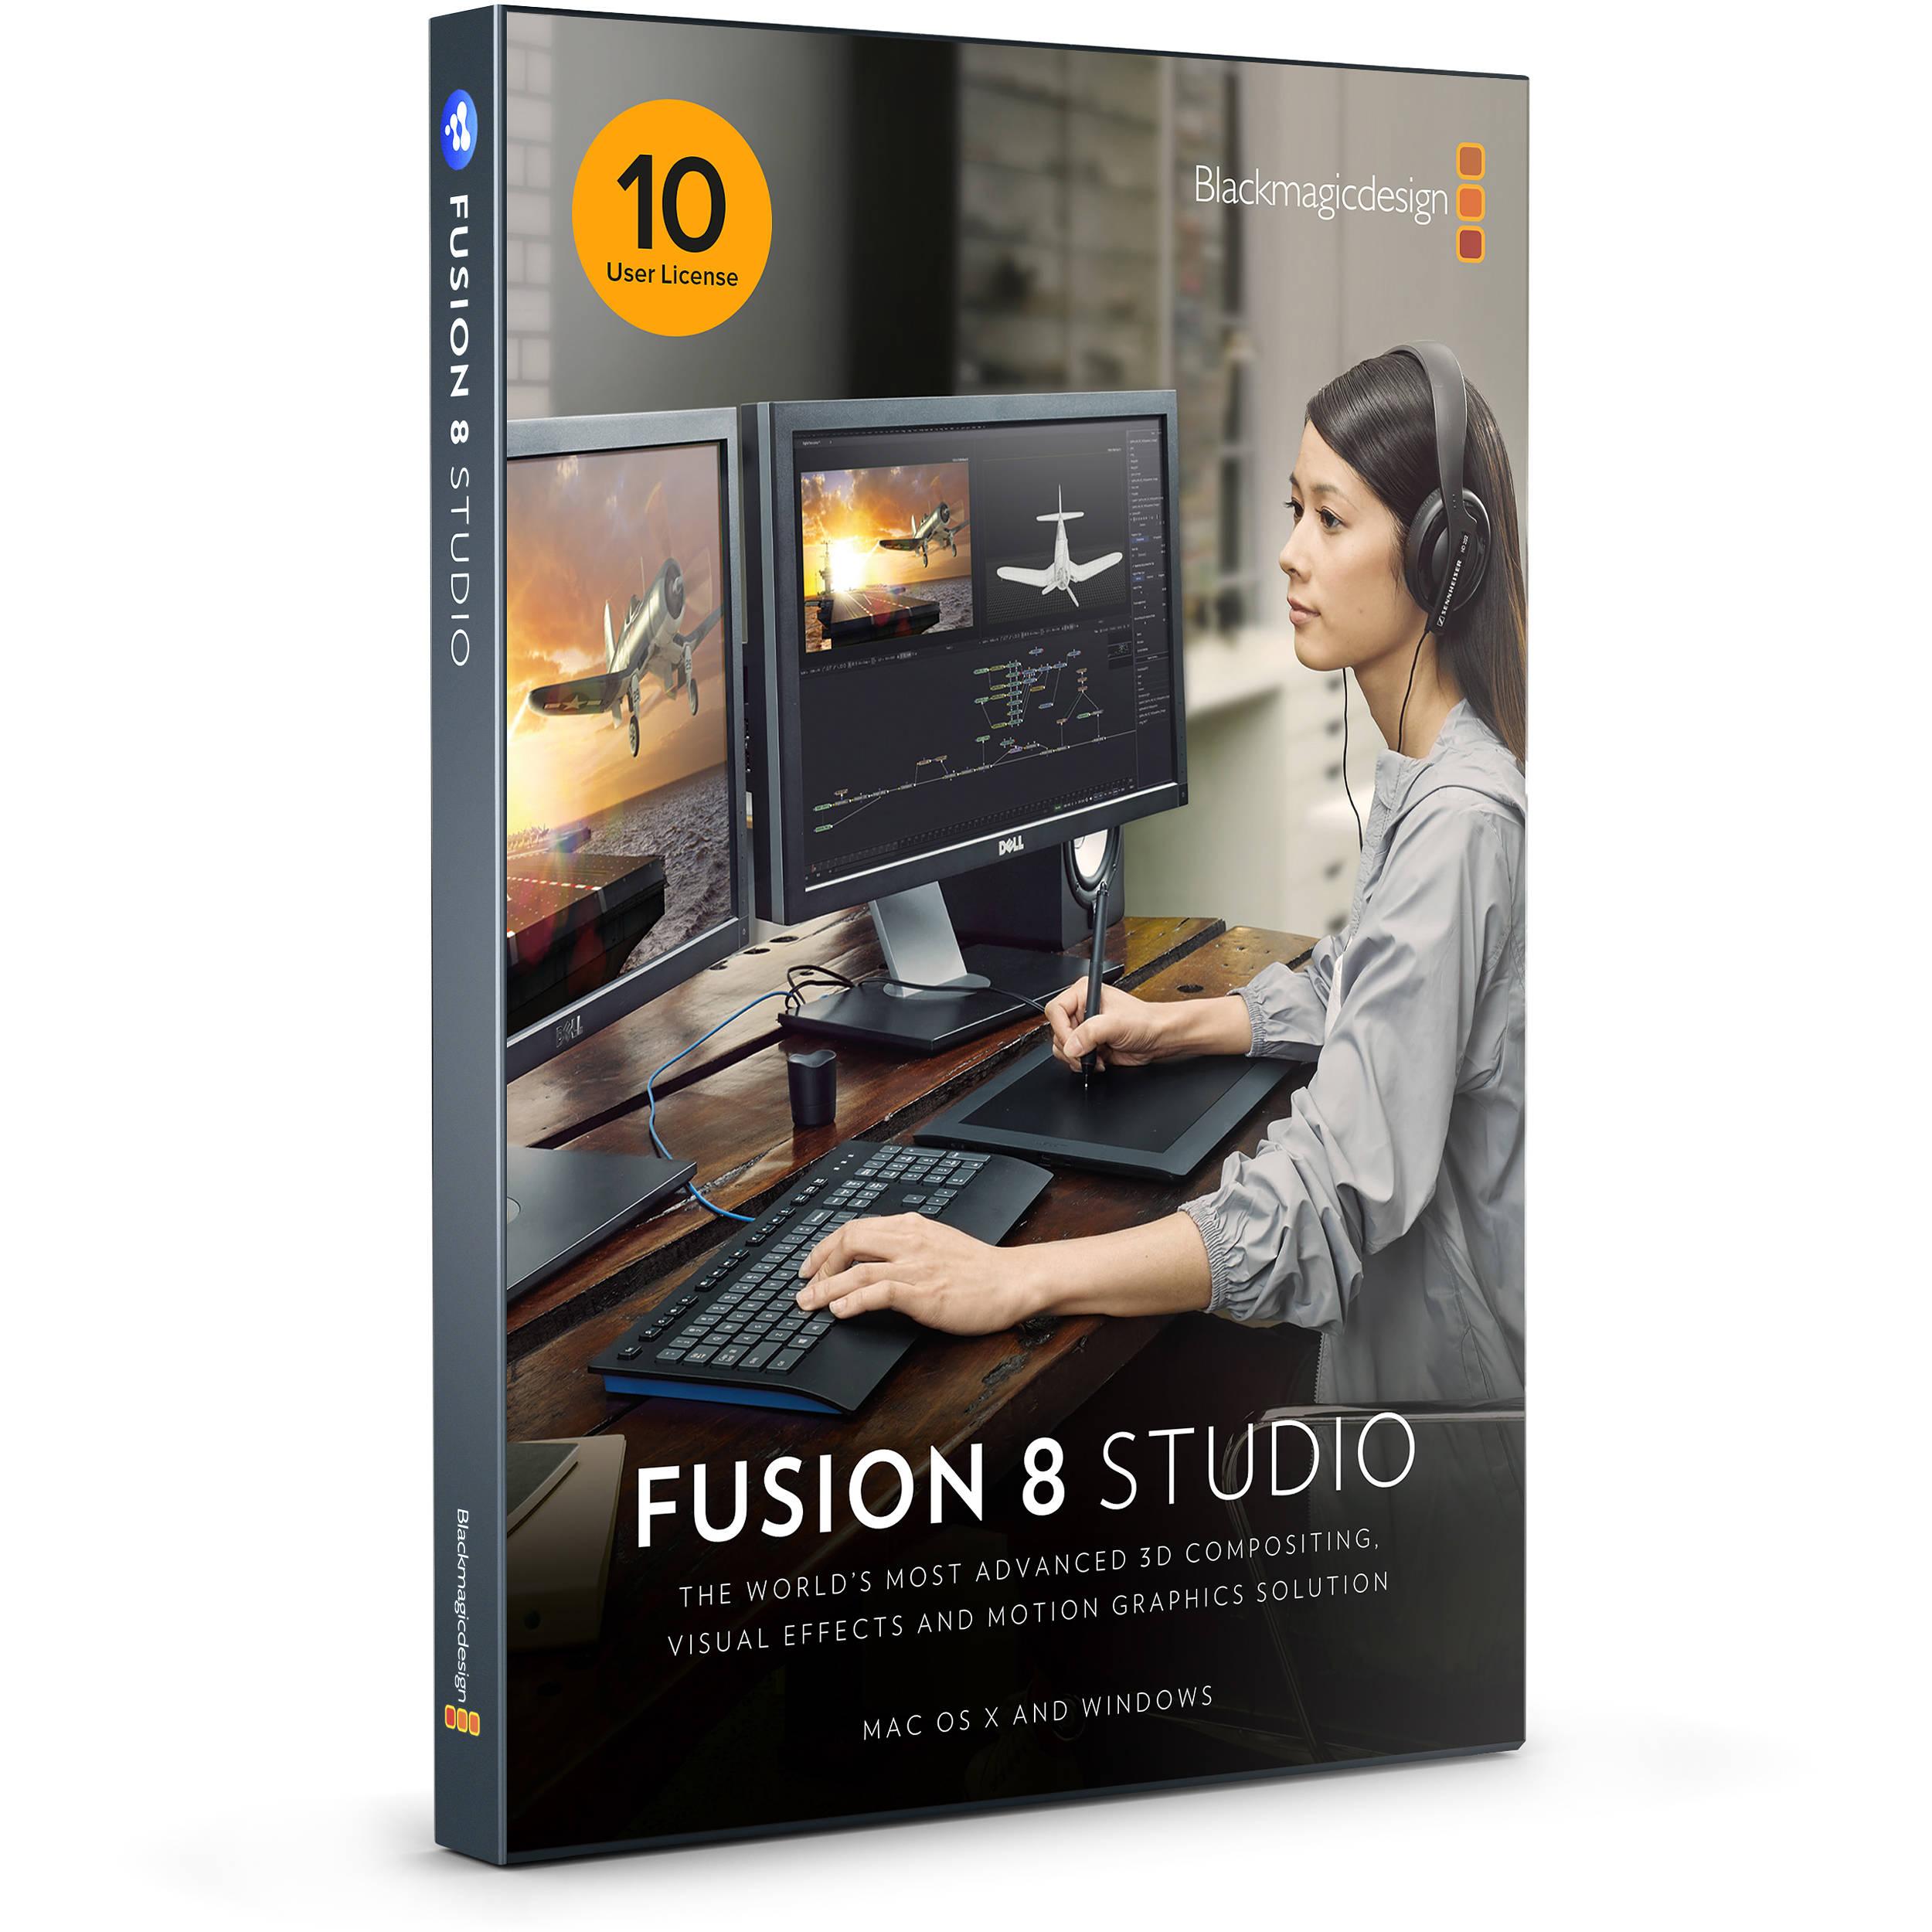 Blackmagic Design Fusion Studio Multipack Dv Stufus Nlpk10 B H